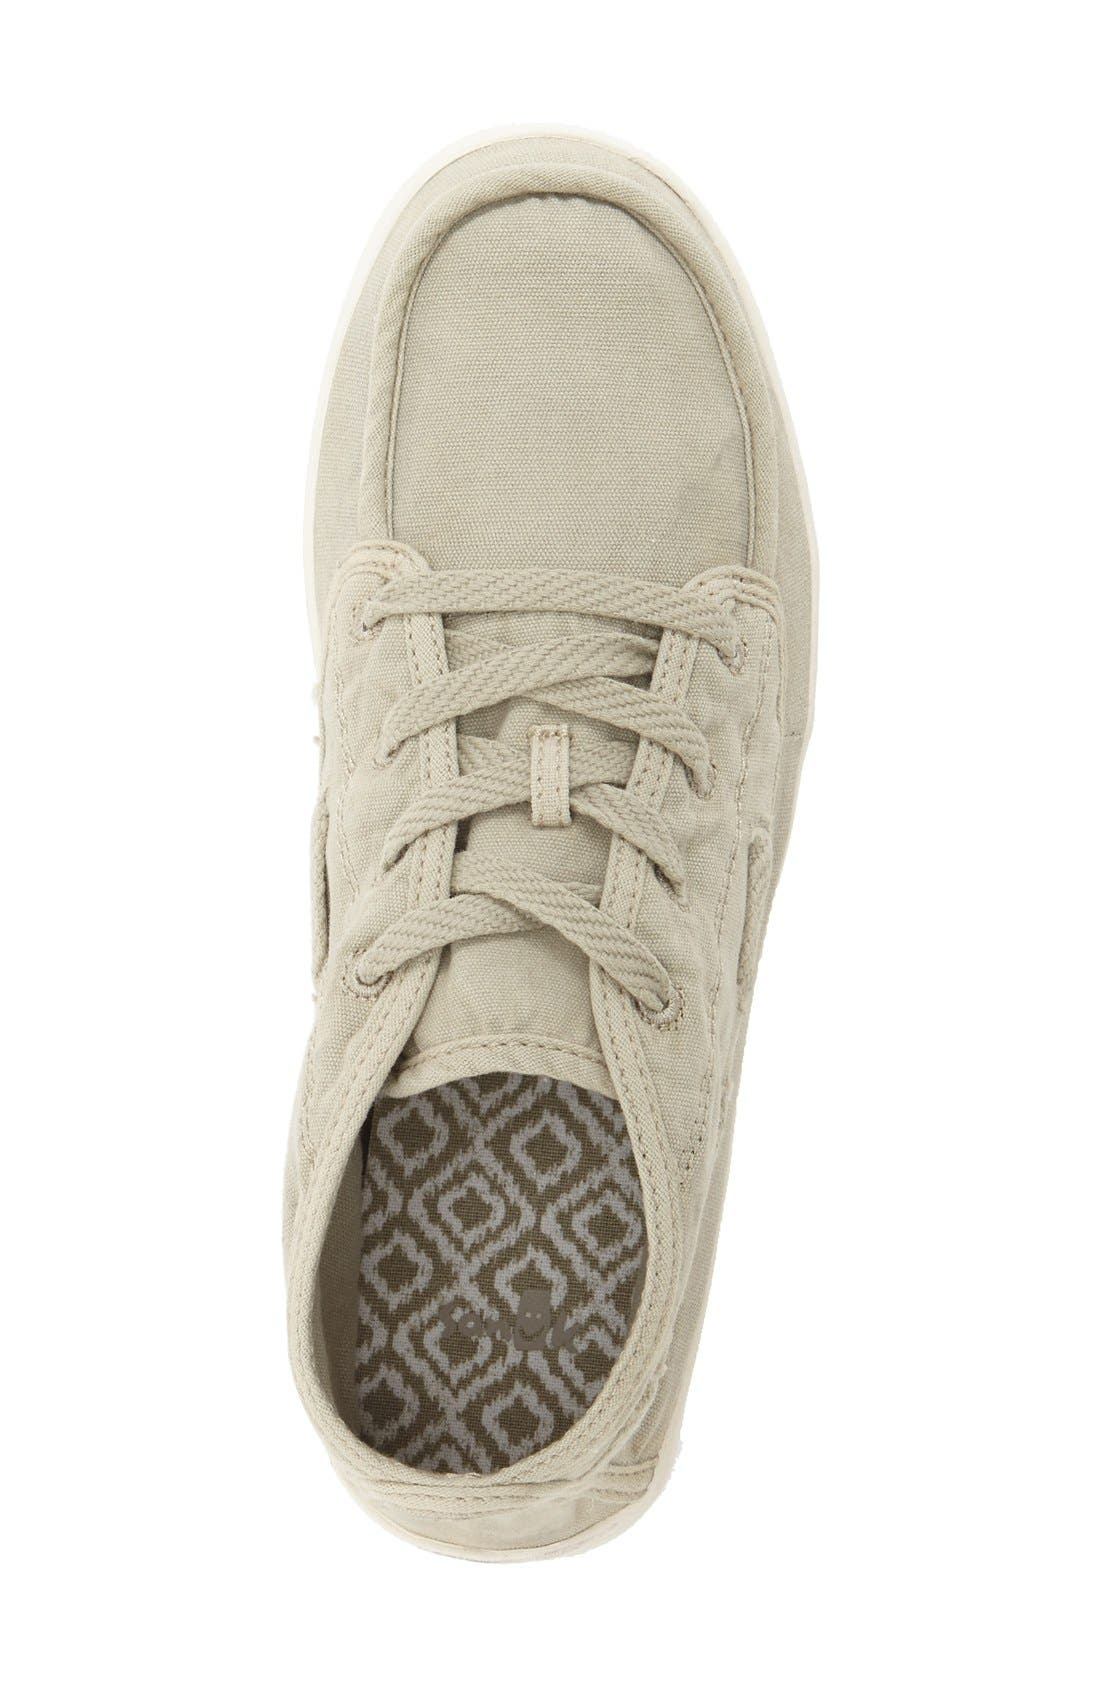 'Vee K Shawn' High Top Sneaker,                             Alternate thumbnail 8, color,